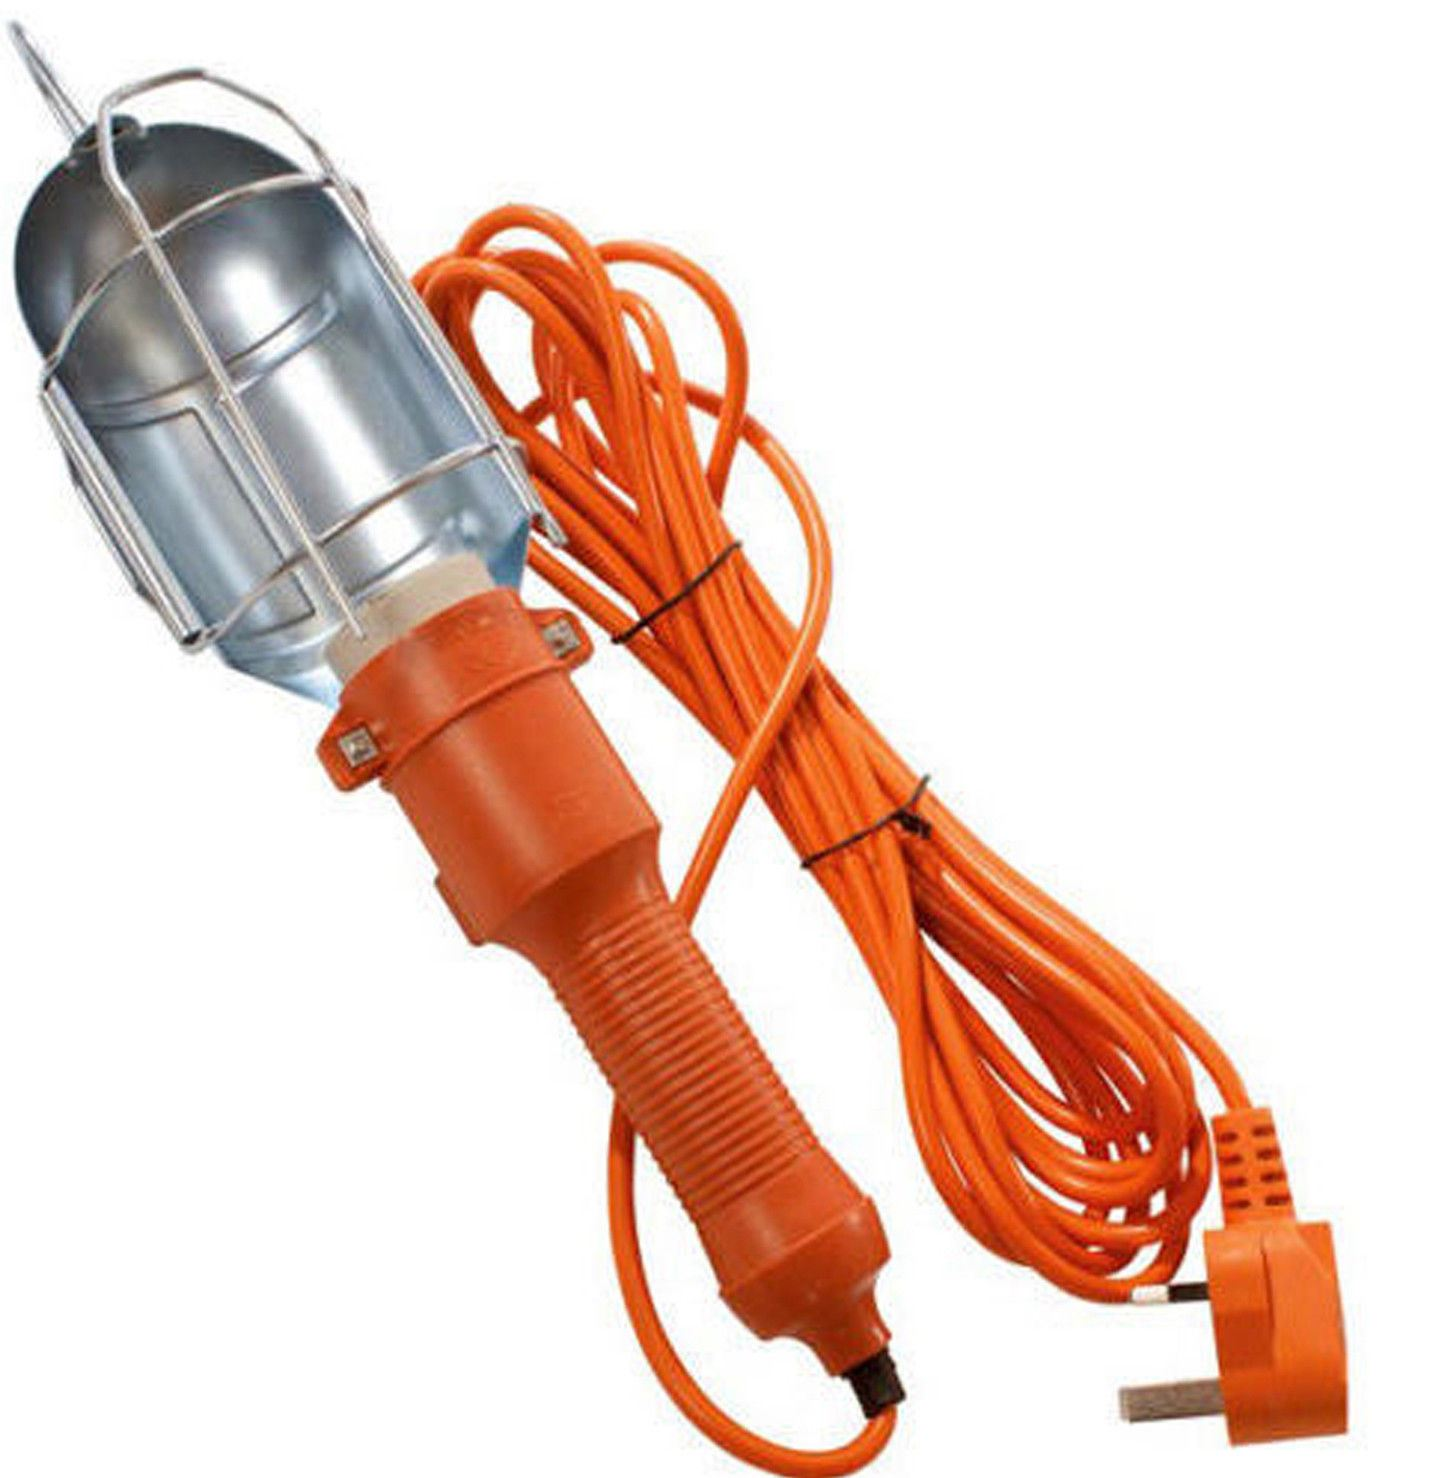 Inspection Lamp Work Light Car Garage Loft 5 Metres New: Car Garage Mains Inspection Lamp Work Light Work Bulb 5M